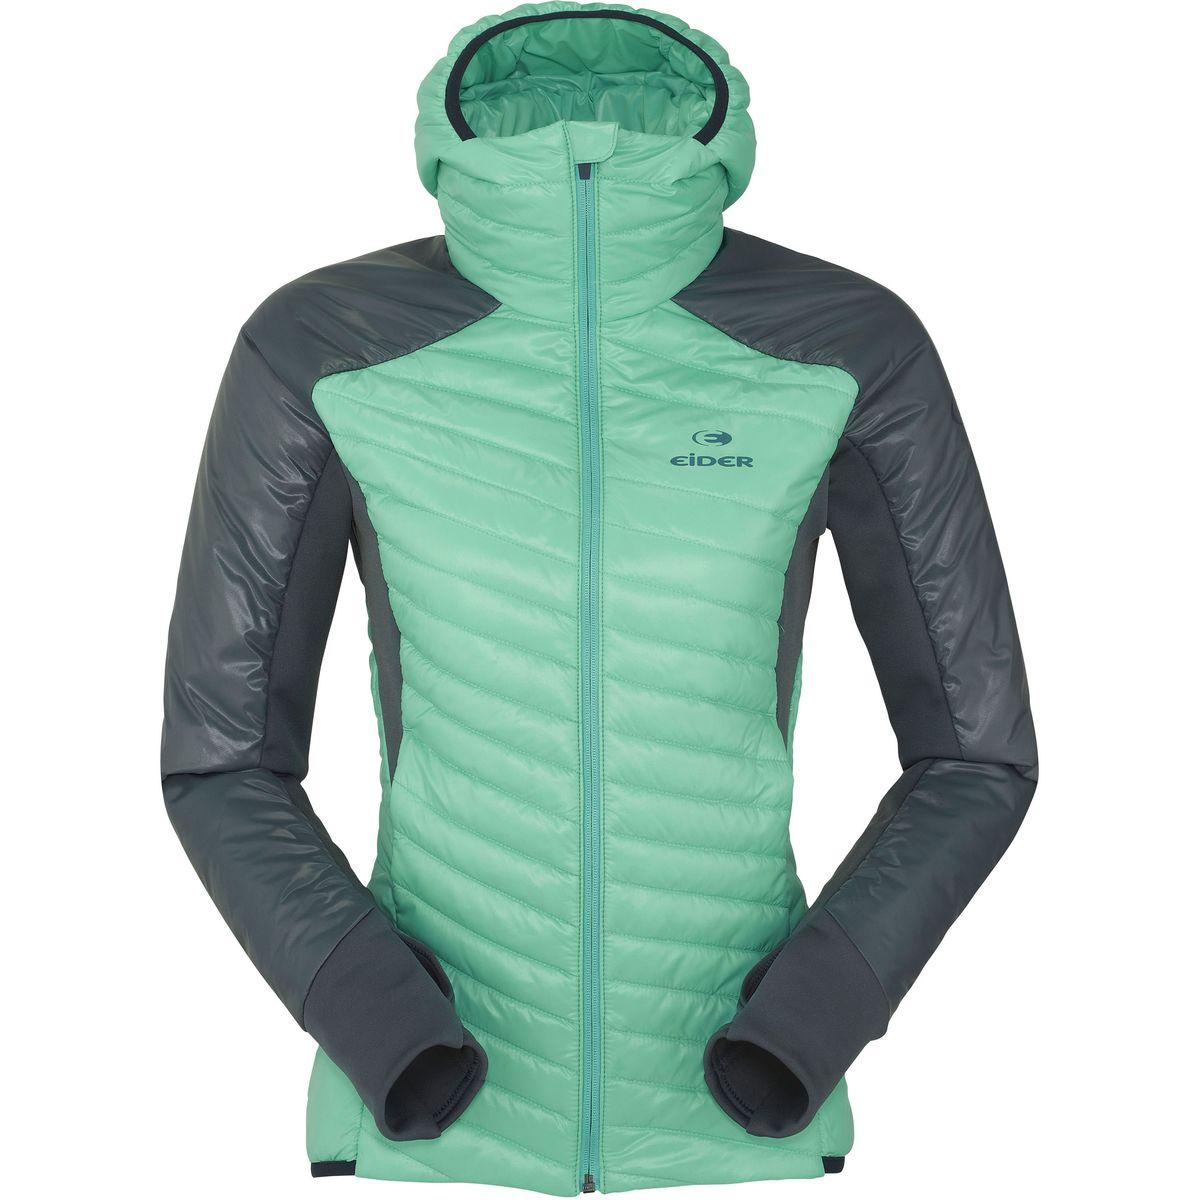 Eider Valdez Insulated Hooded Jacket - Women